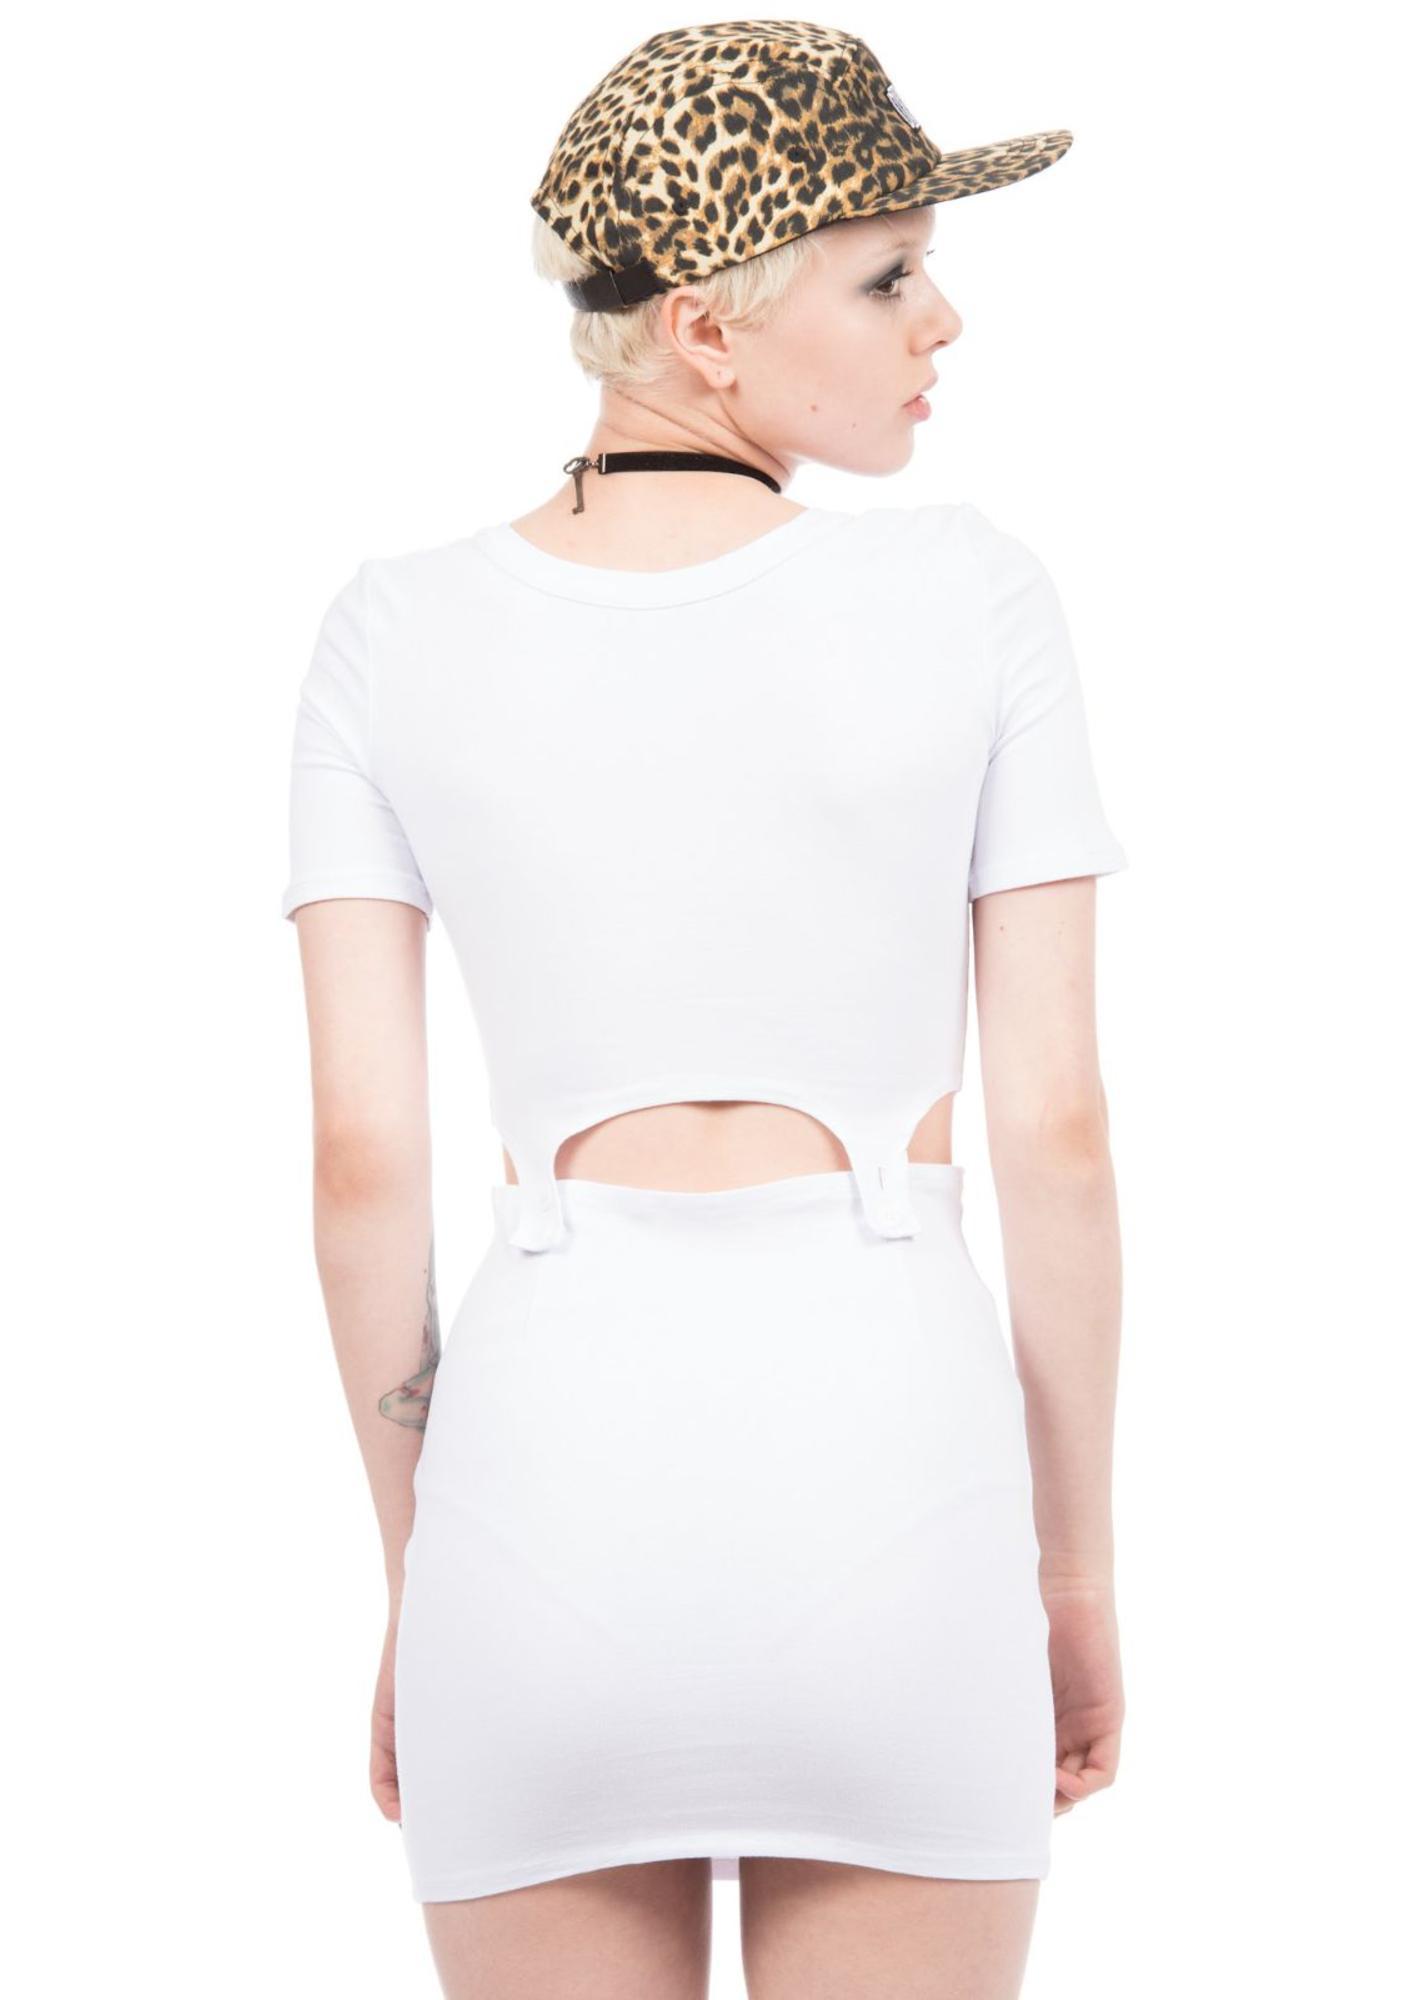 Shown To Scale Bundy Dress